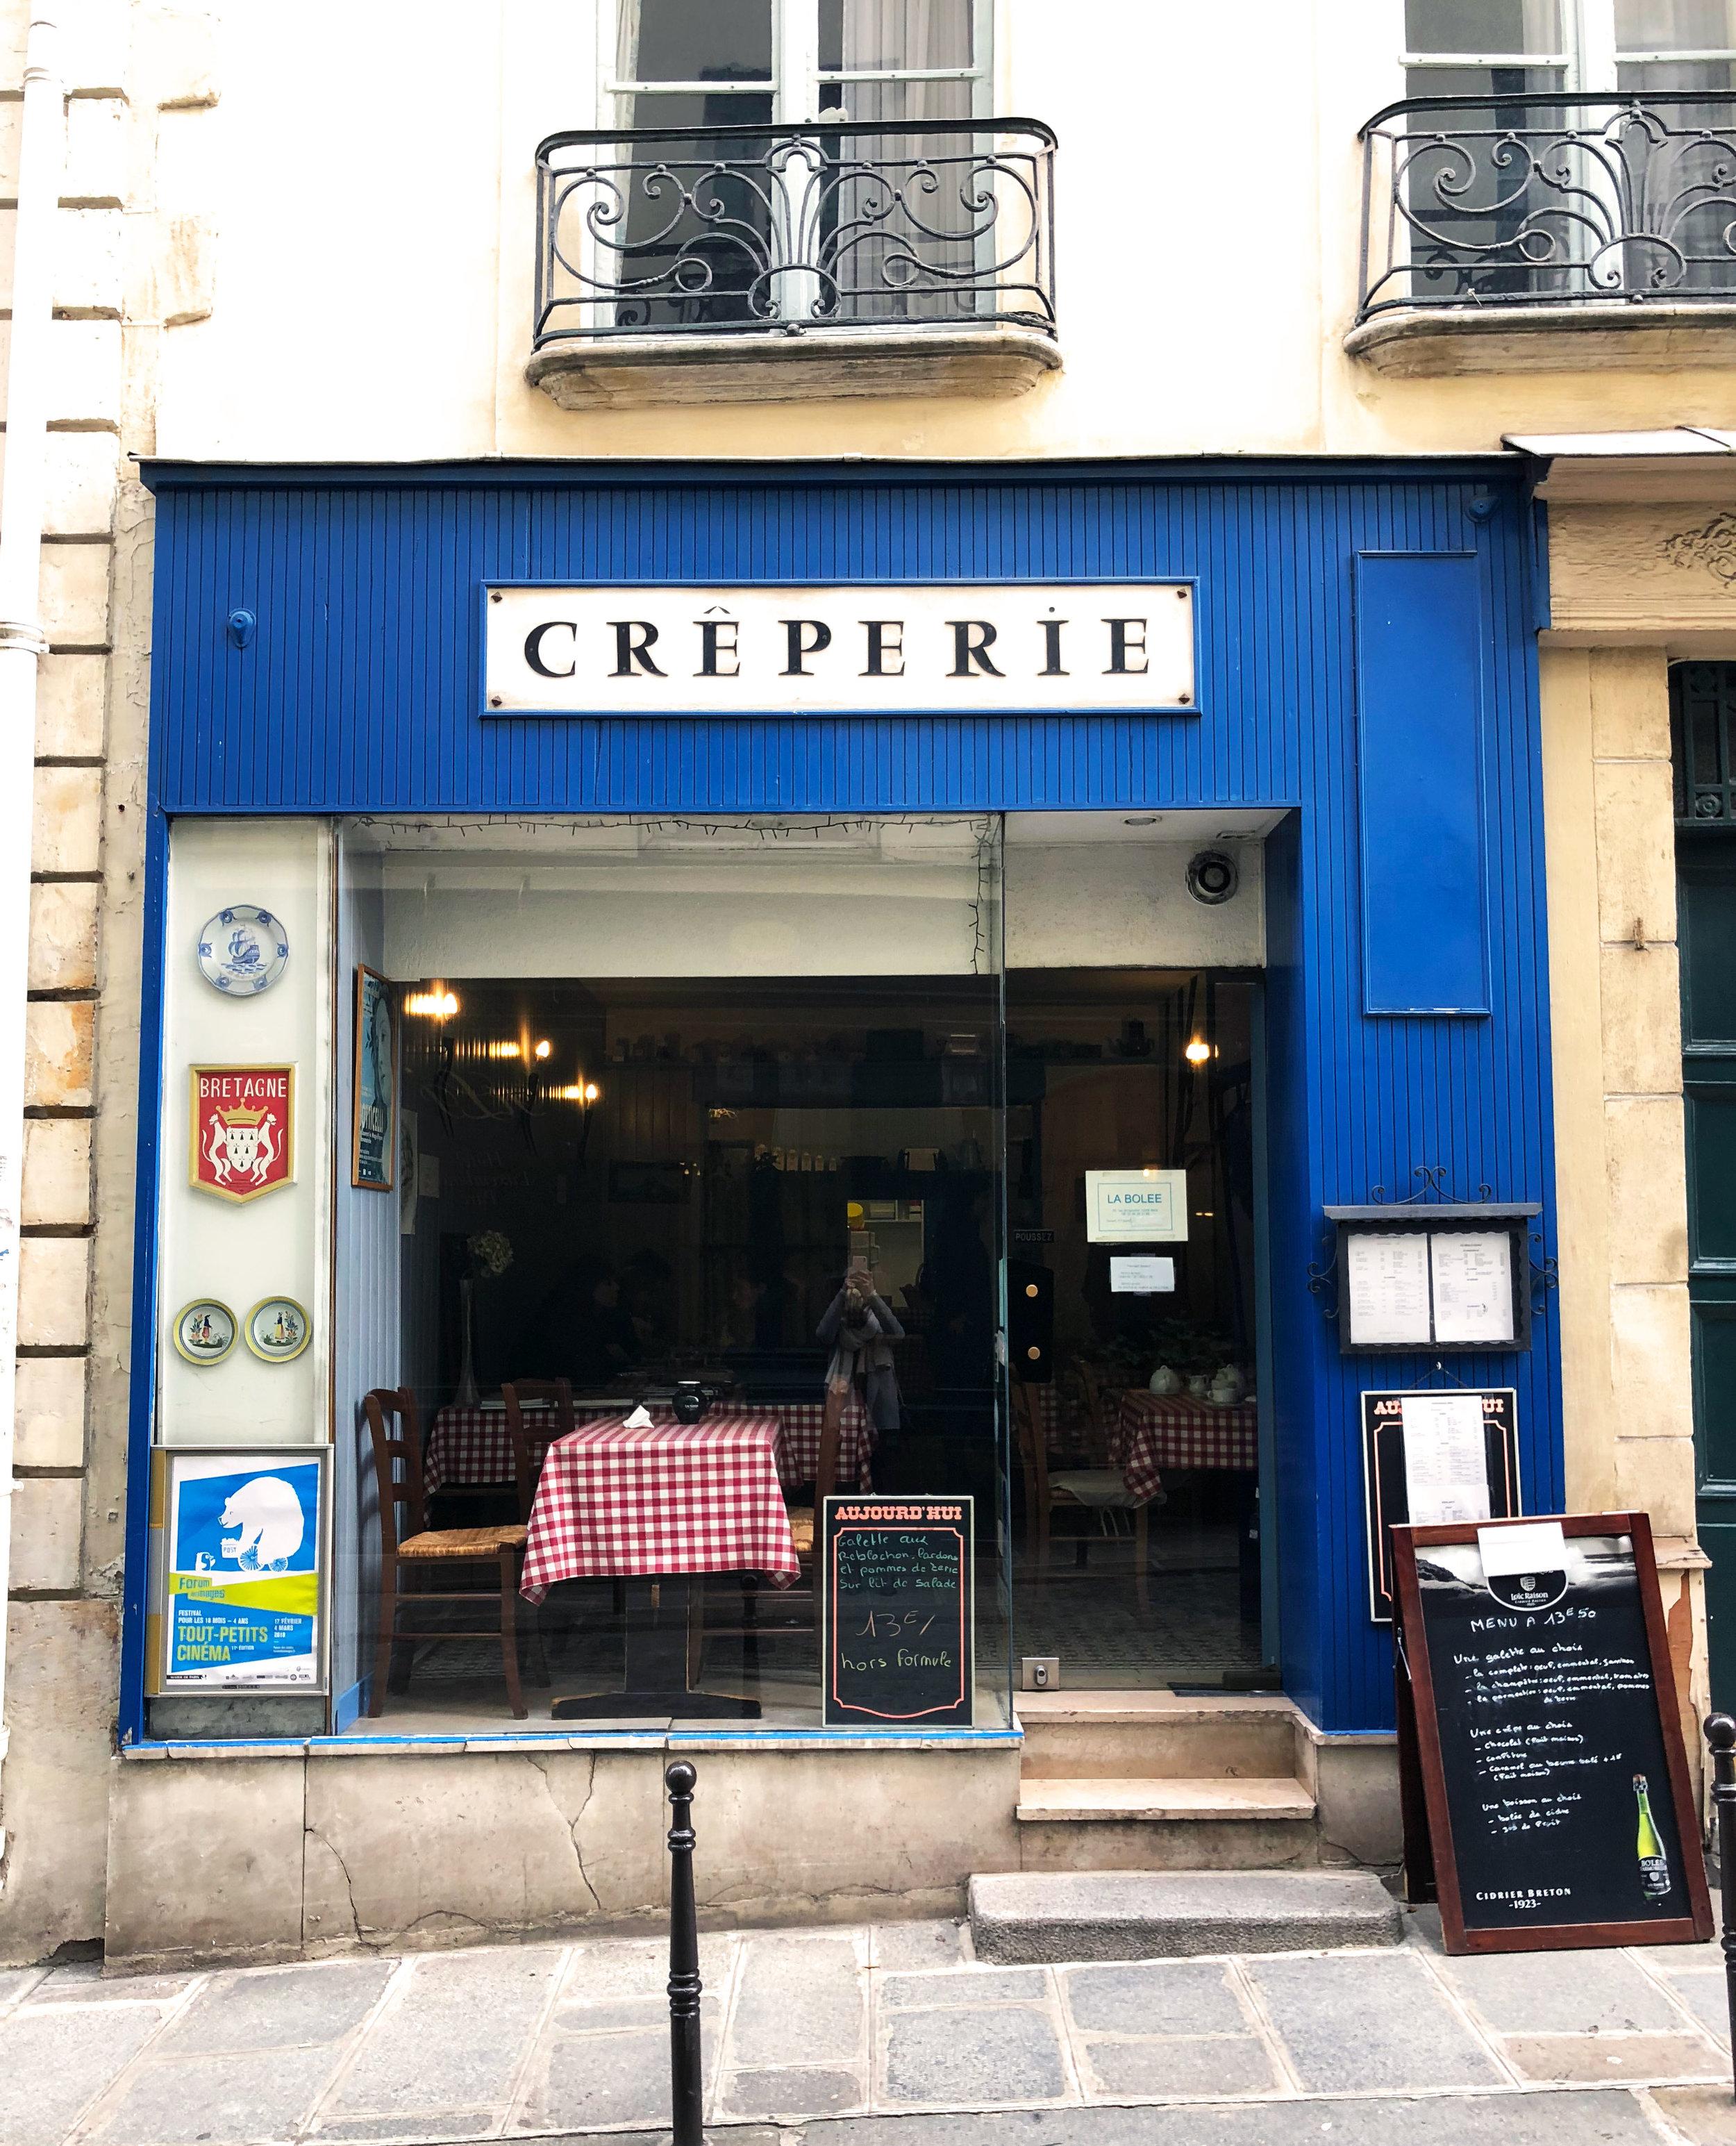 Creperie La Bolee in 6th Arr. near Luxembourg Gardens